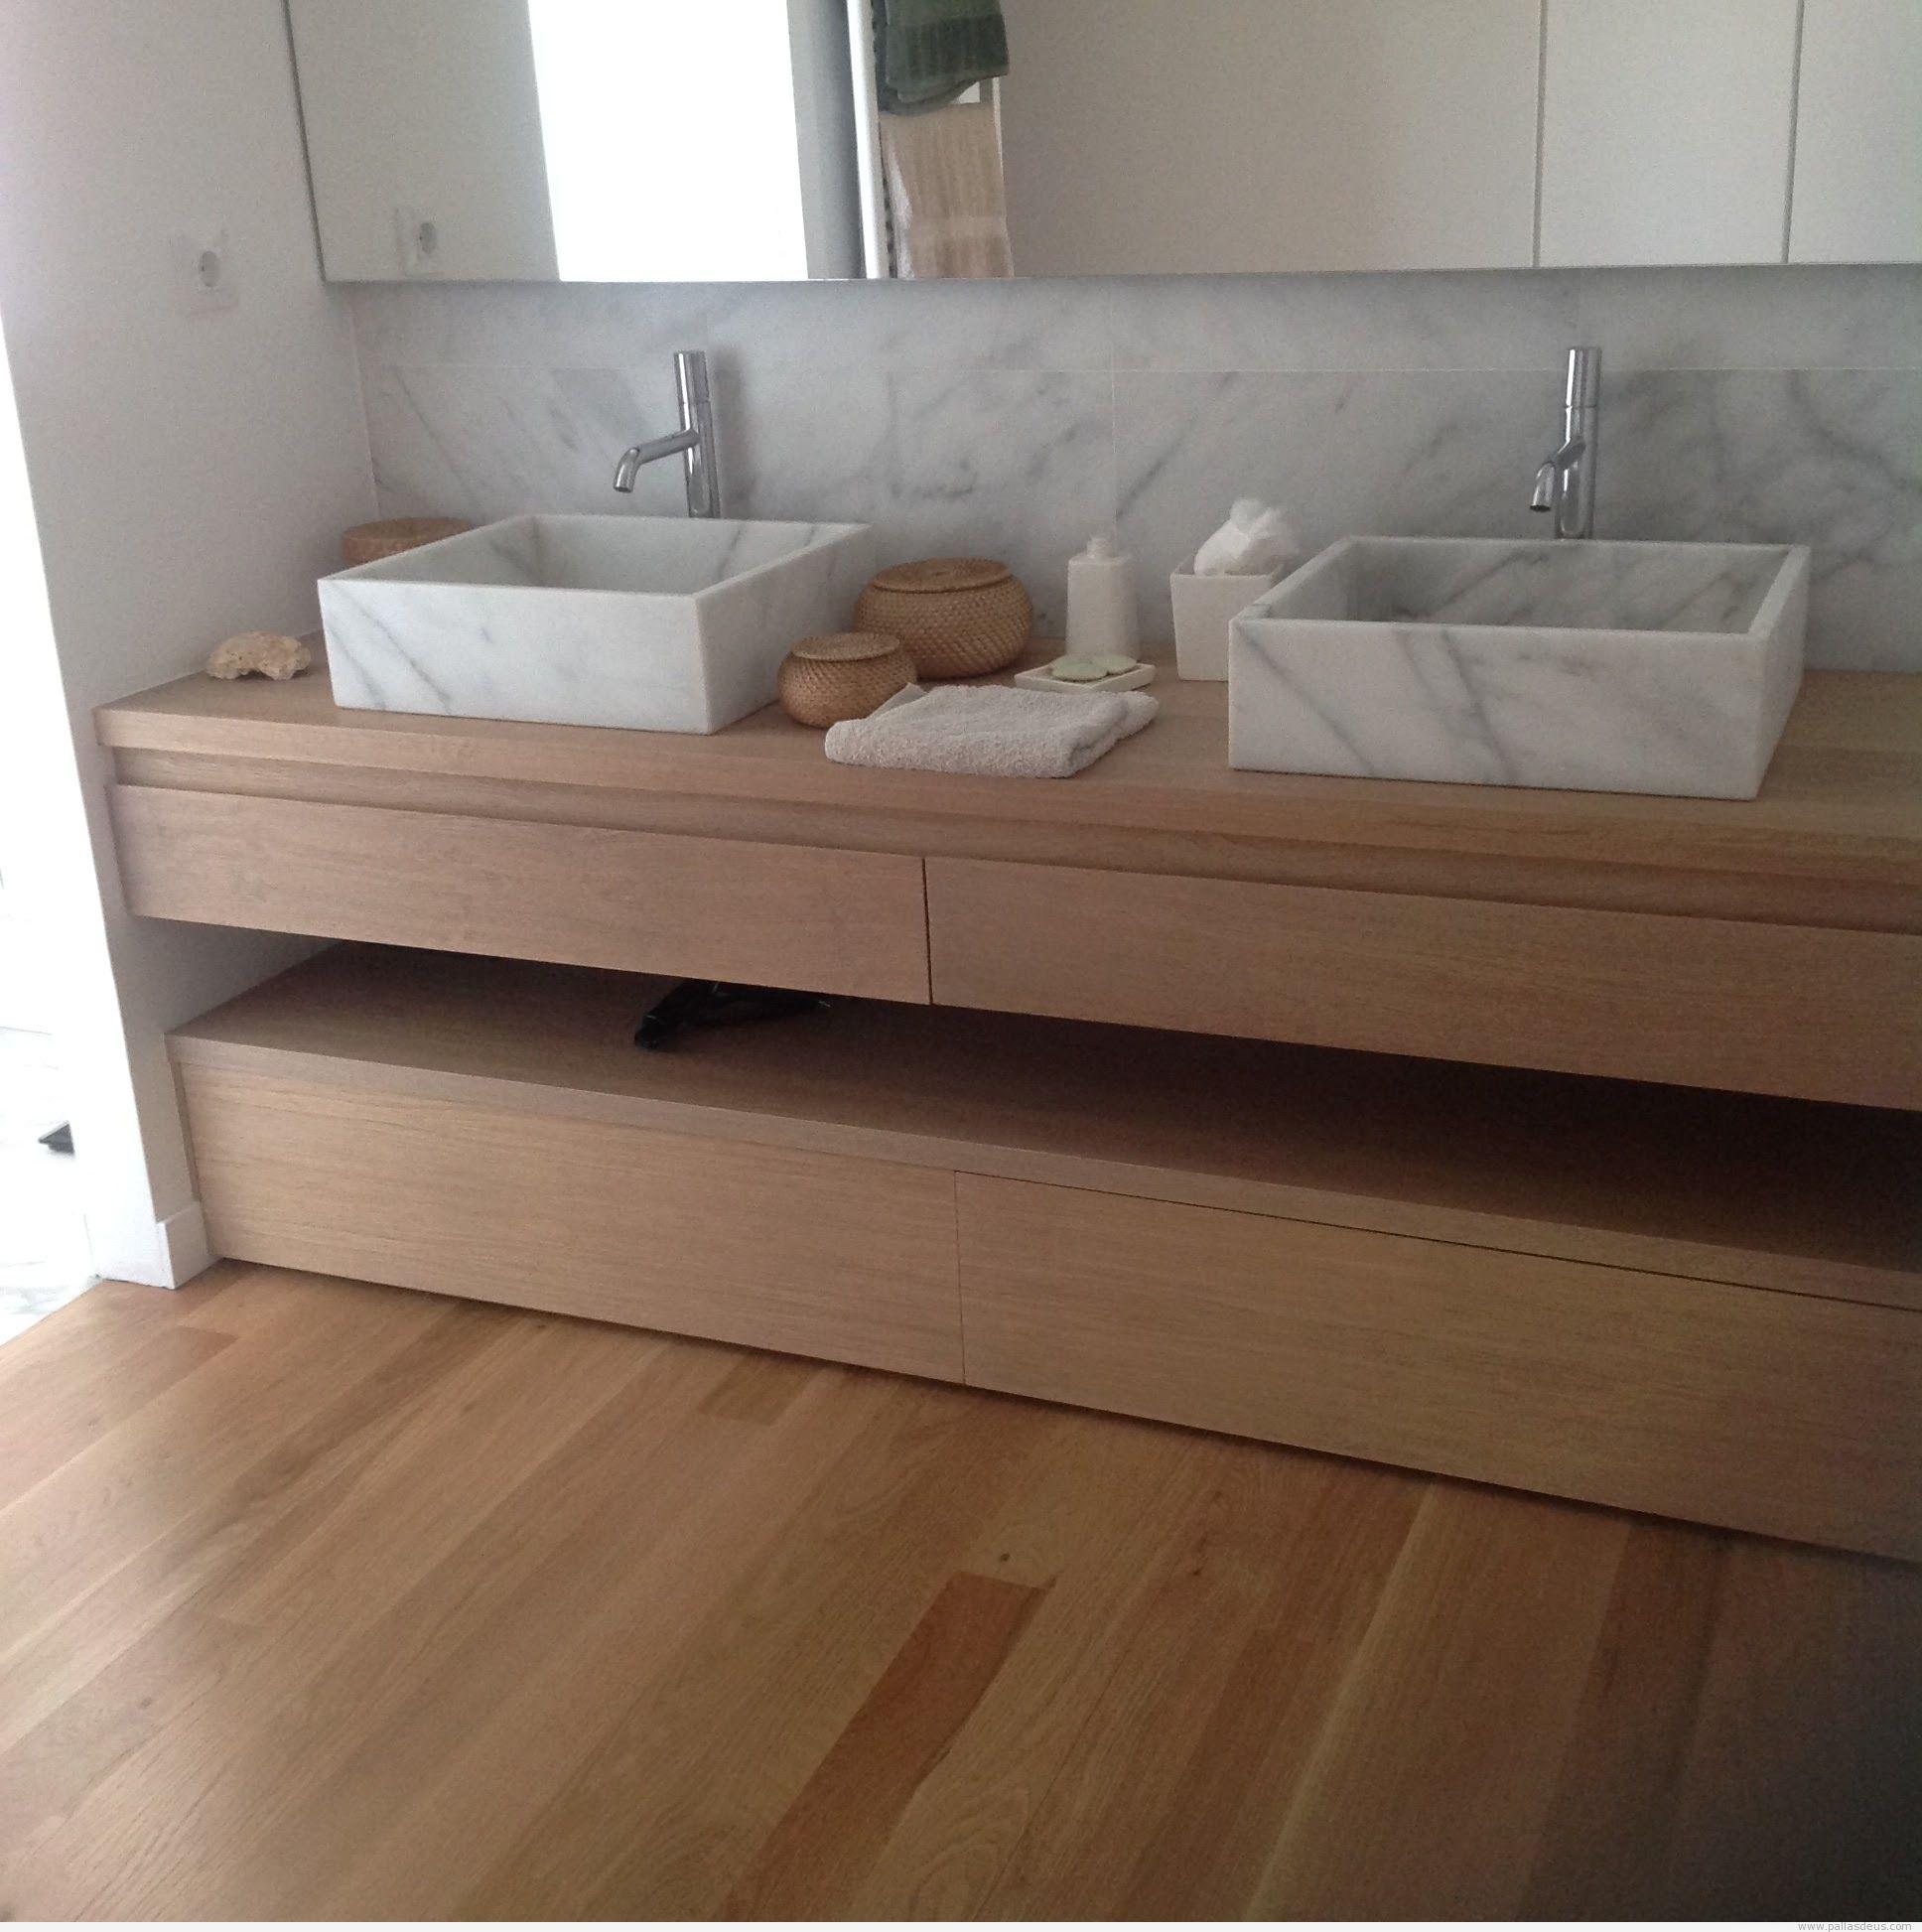 Muebles bao madera maciza finest mueble de bao clsico uac for Muebles de madera maciza precios